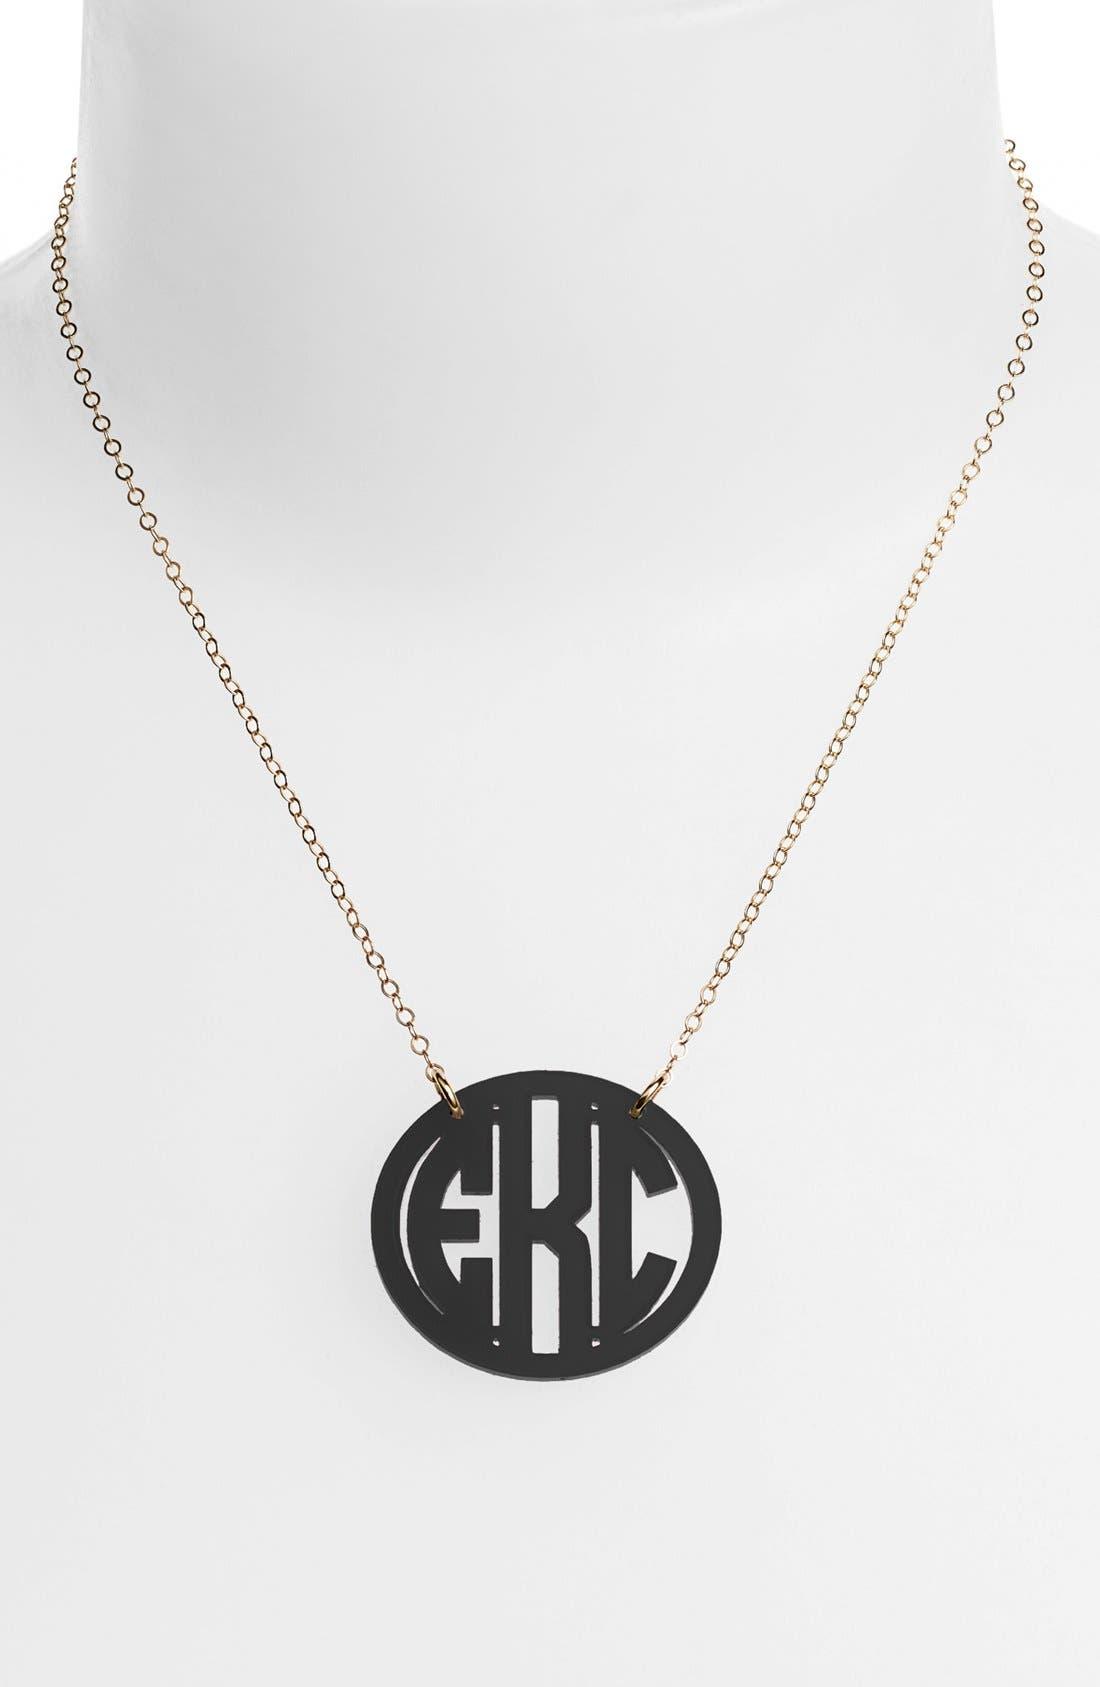 MOON AND LOLA Medium Oval Personalized Monogram Pendant Necklace, Main, color, EBONY/ GOLD